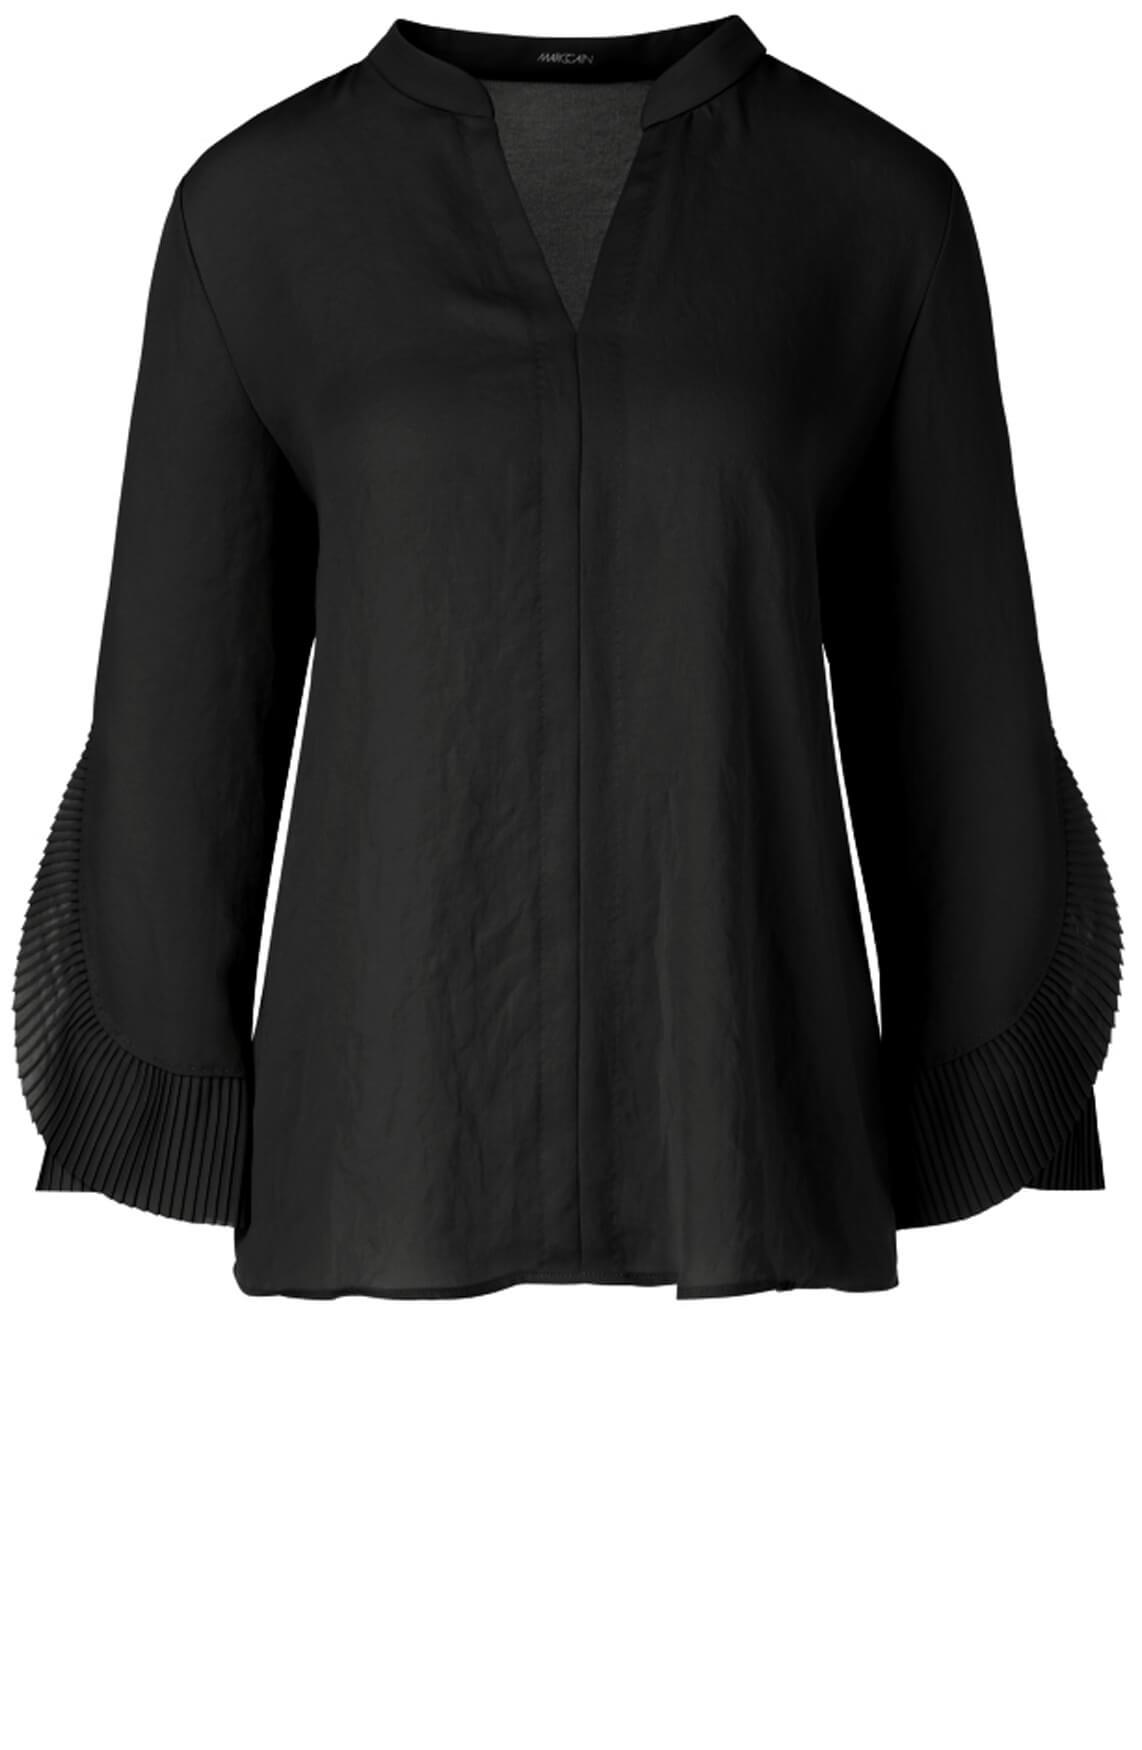 Marccain Dames Blouse met plissé plooien zwart